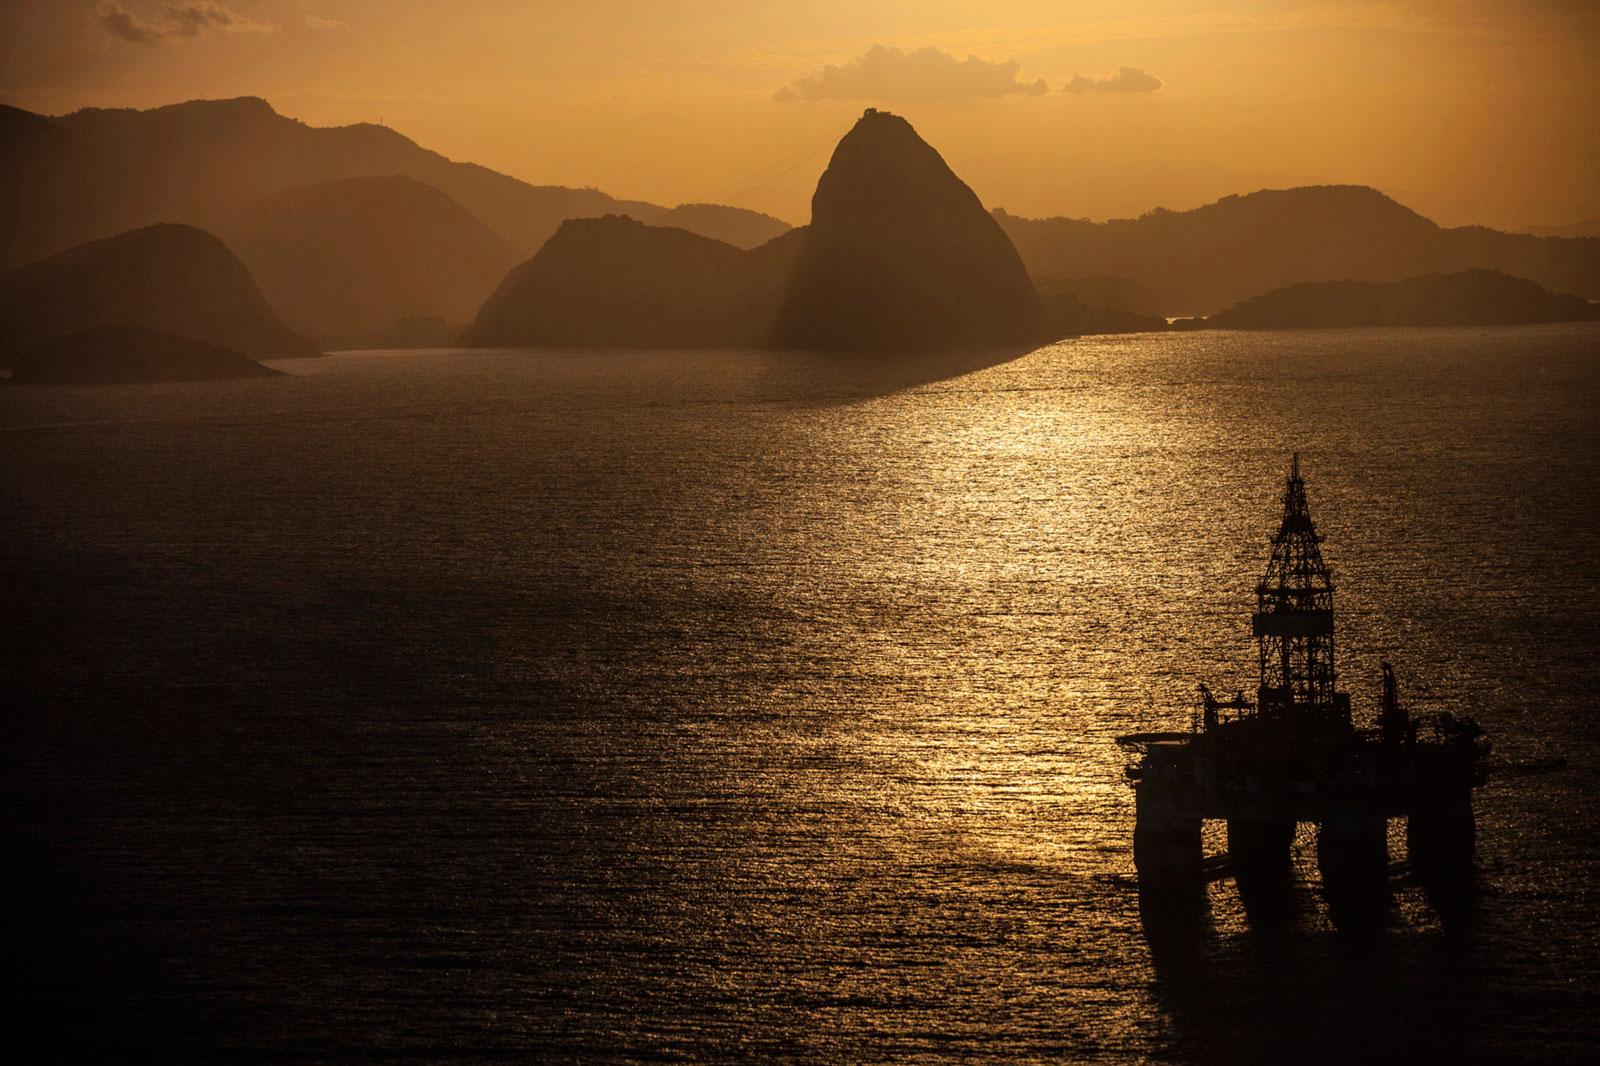 An oil platform floats near the coast of Rio de Janeiro on Wednesday, May 20, 2015.